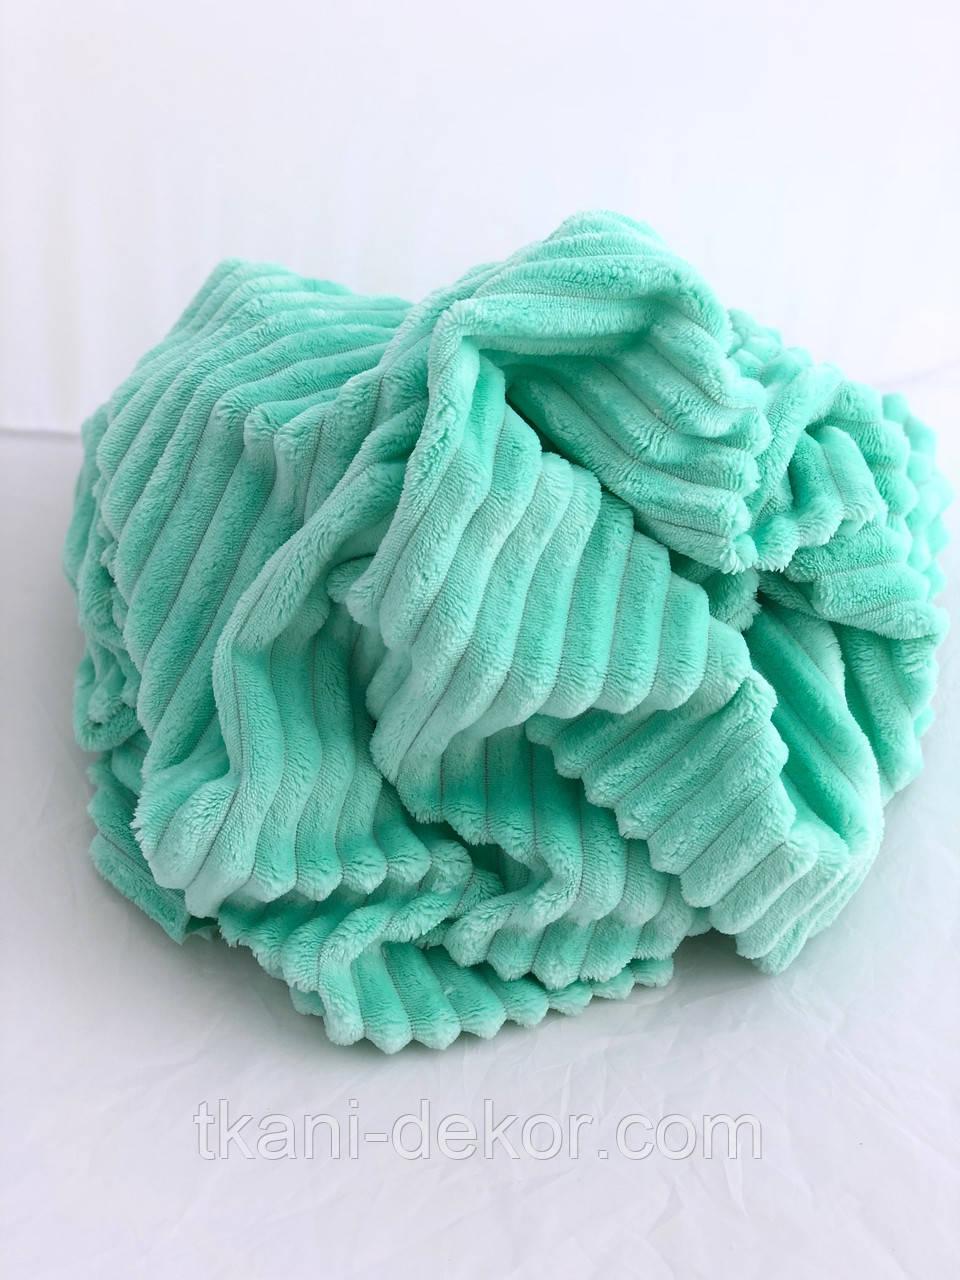 Плюшевая ткань Minky Stripes мятного цвета (шарпей)  Лоскуты (0,95*125)